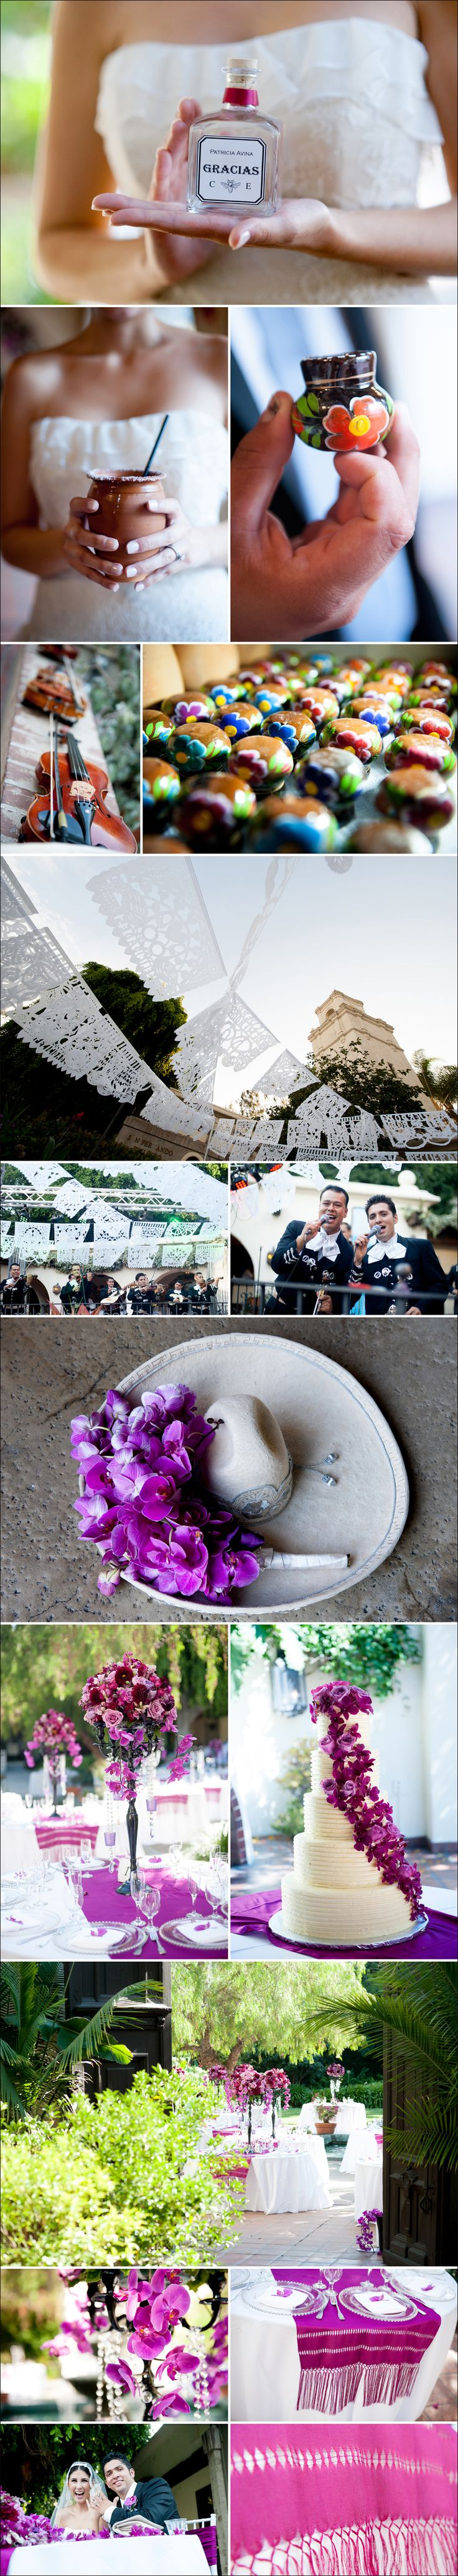 CE0261 Cristy and Eli Mexican Elegance, LA River Center and Garden Wedding Photos